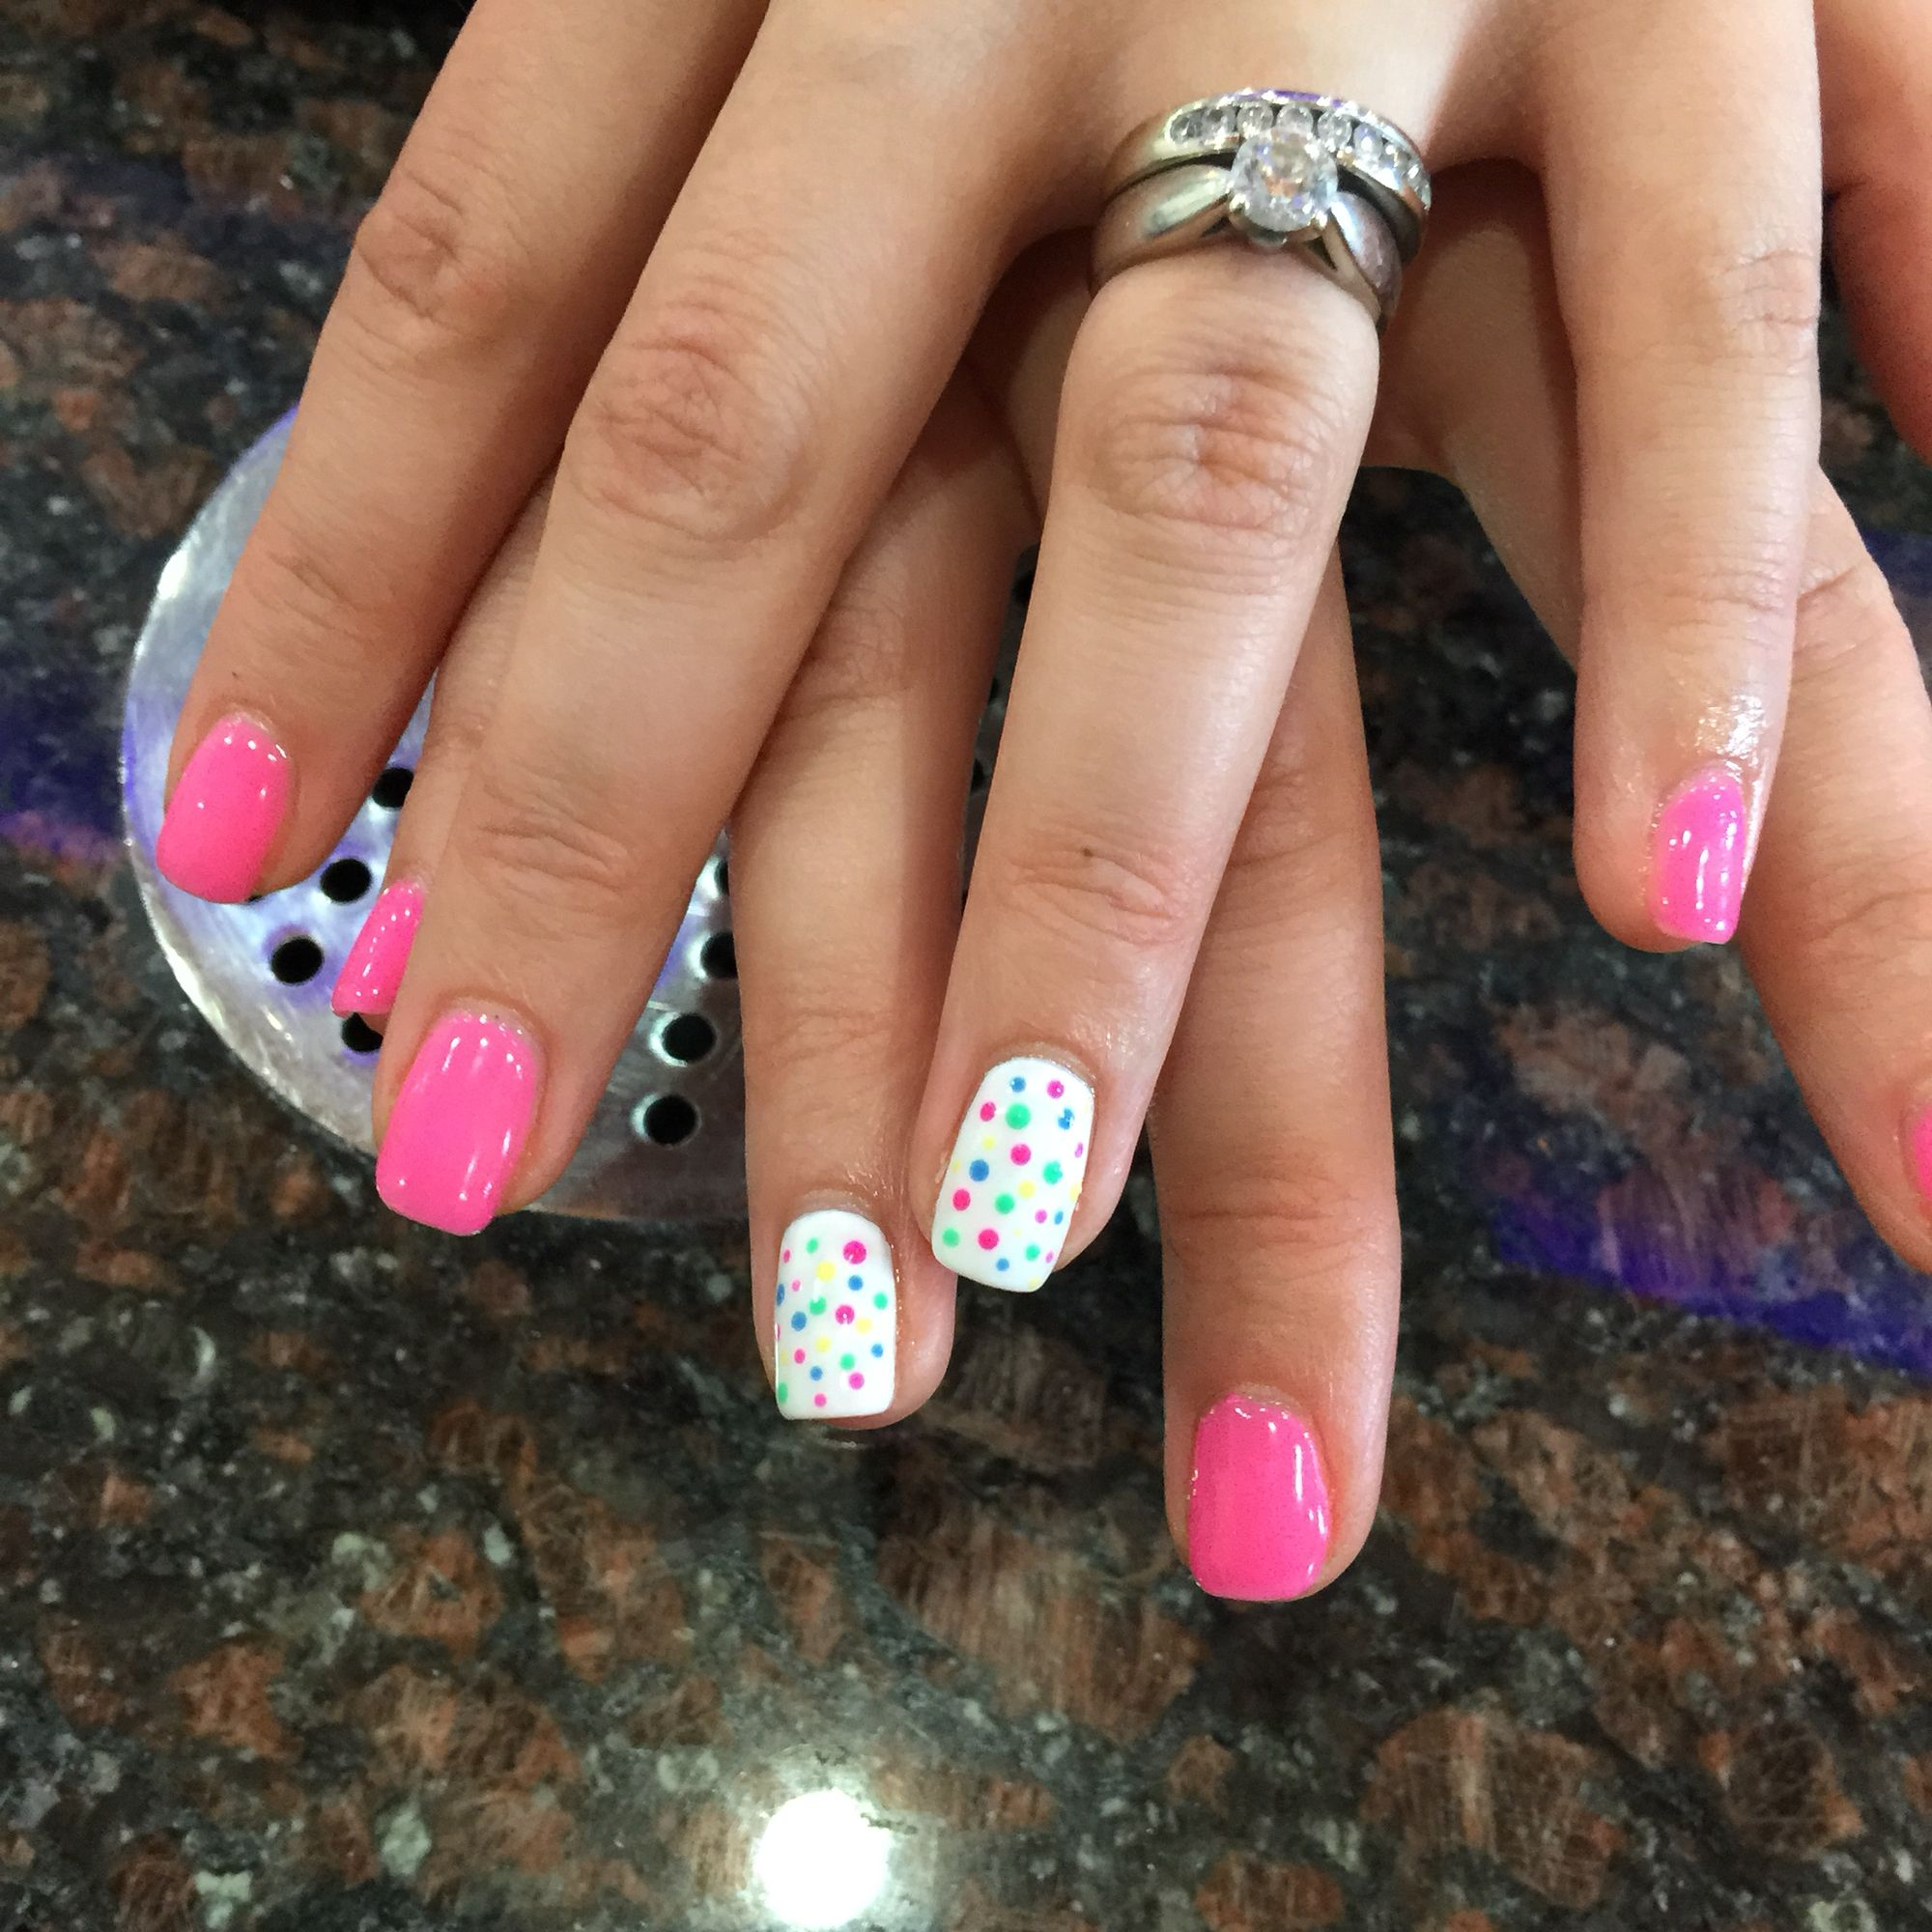 HannahQ nails and spa   HannahQ nails design   Pinterest   Spa